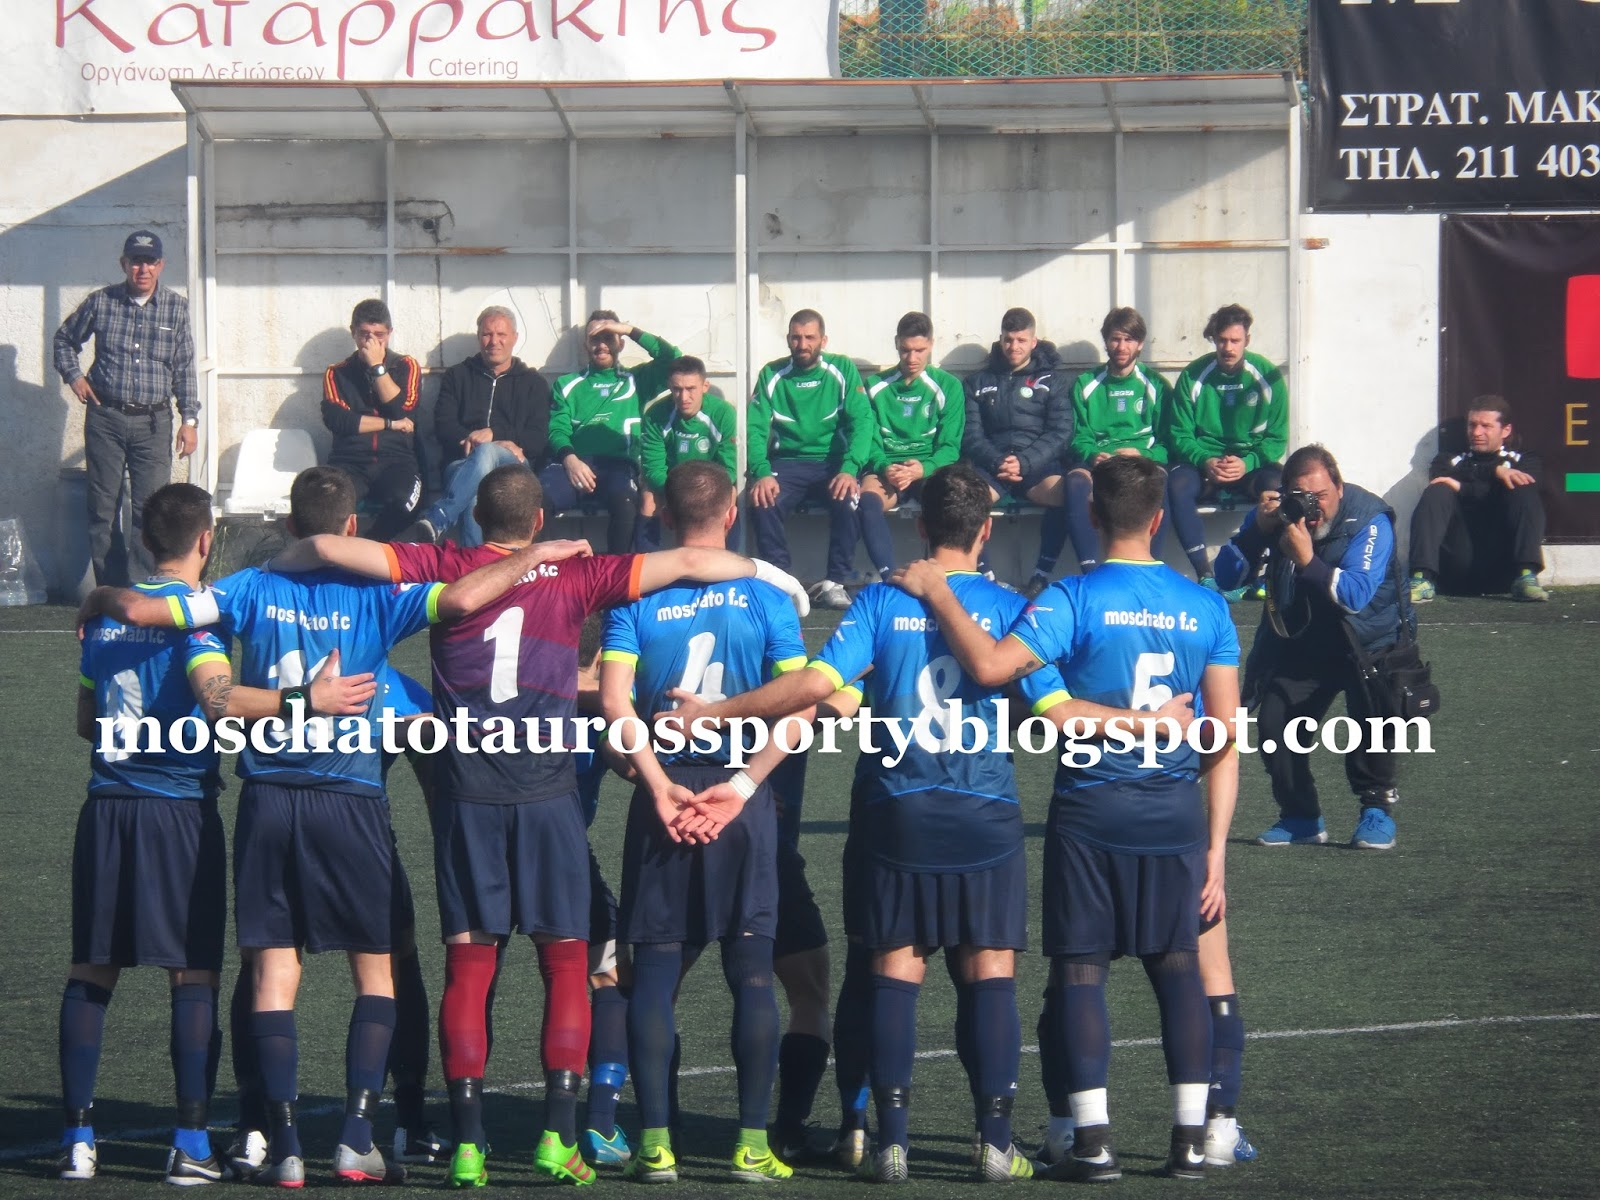 78f421ecbad9 Νίκη της ΑΕ Μοσχάτου επι του Παντζιτζιφιακού Κάρπαθος με 5-0 ...